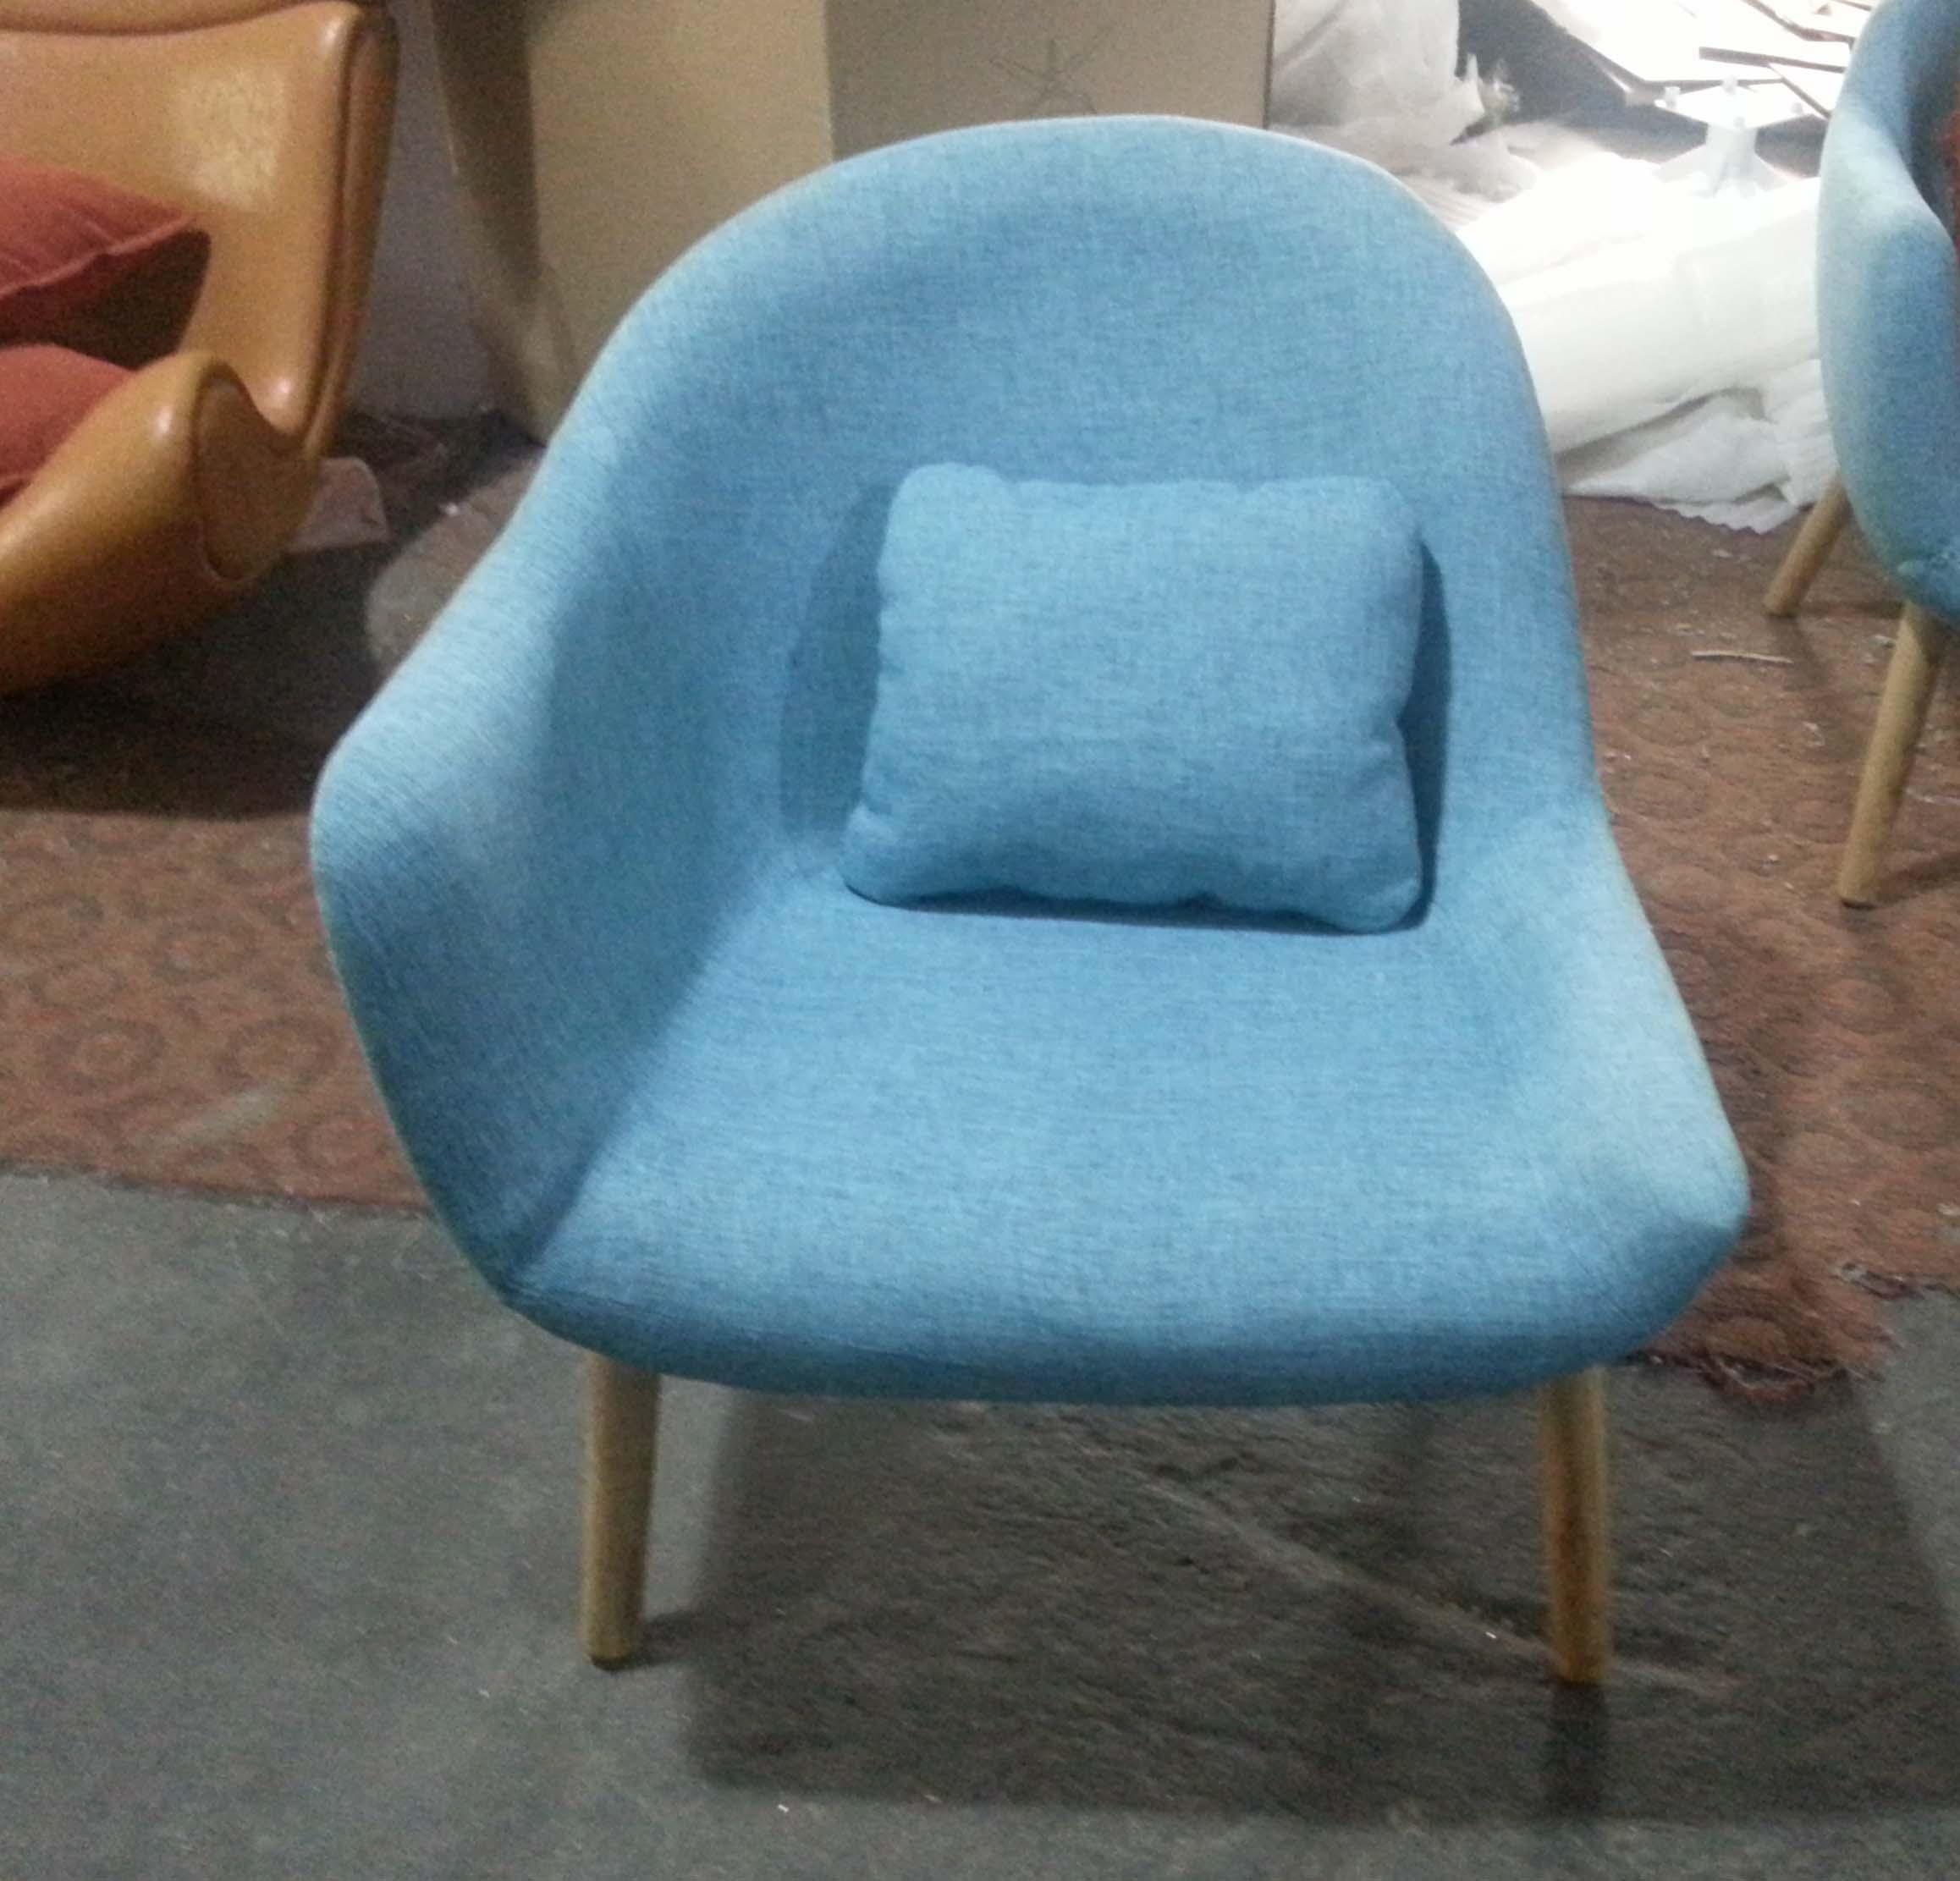 实物MAD Chair 疯狂 玻璃钢沙发椅 休闲单人沙发 Marcel wanders冷色